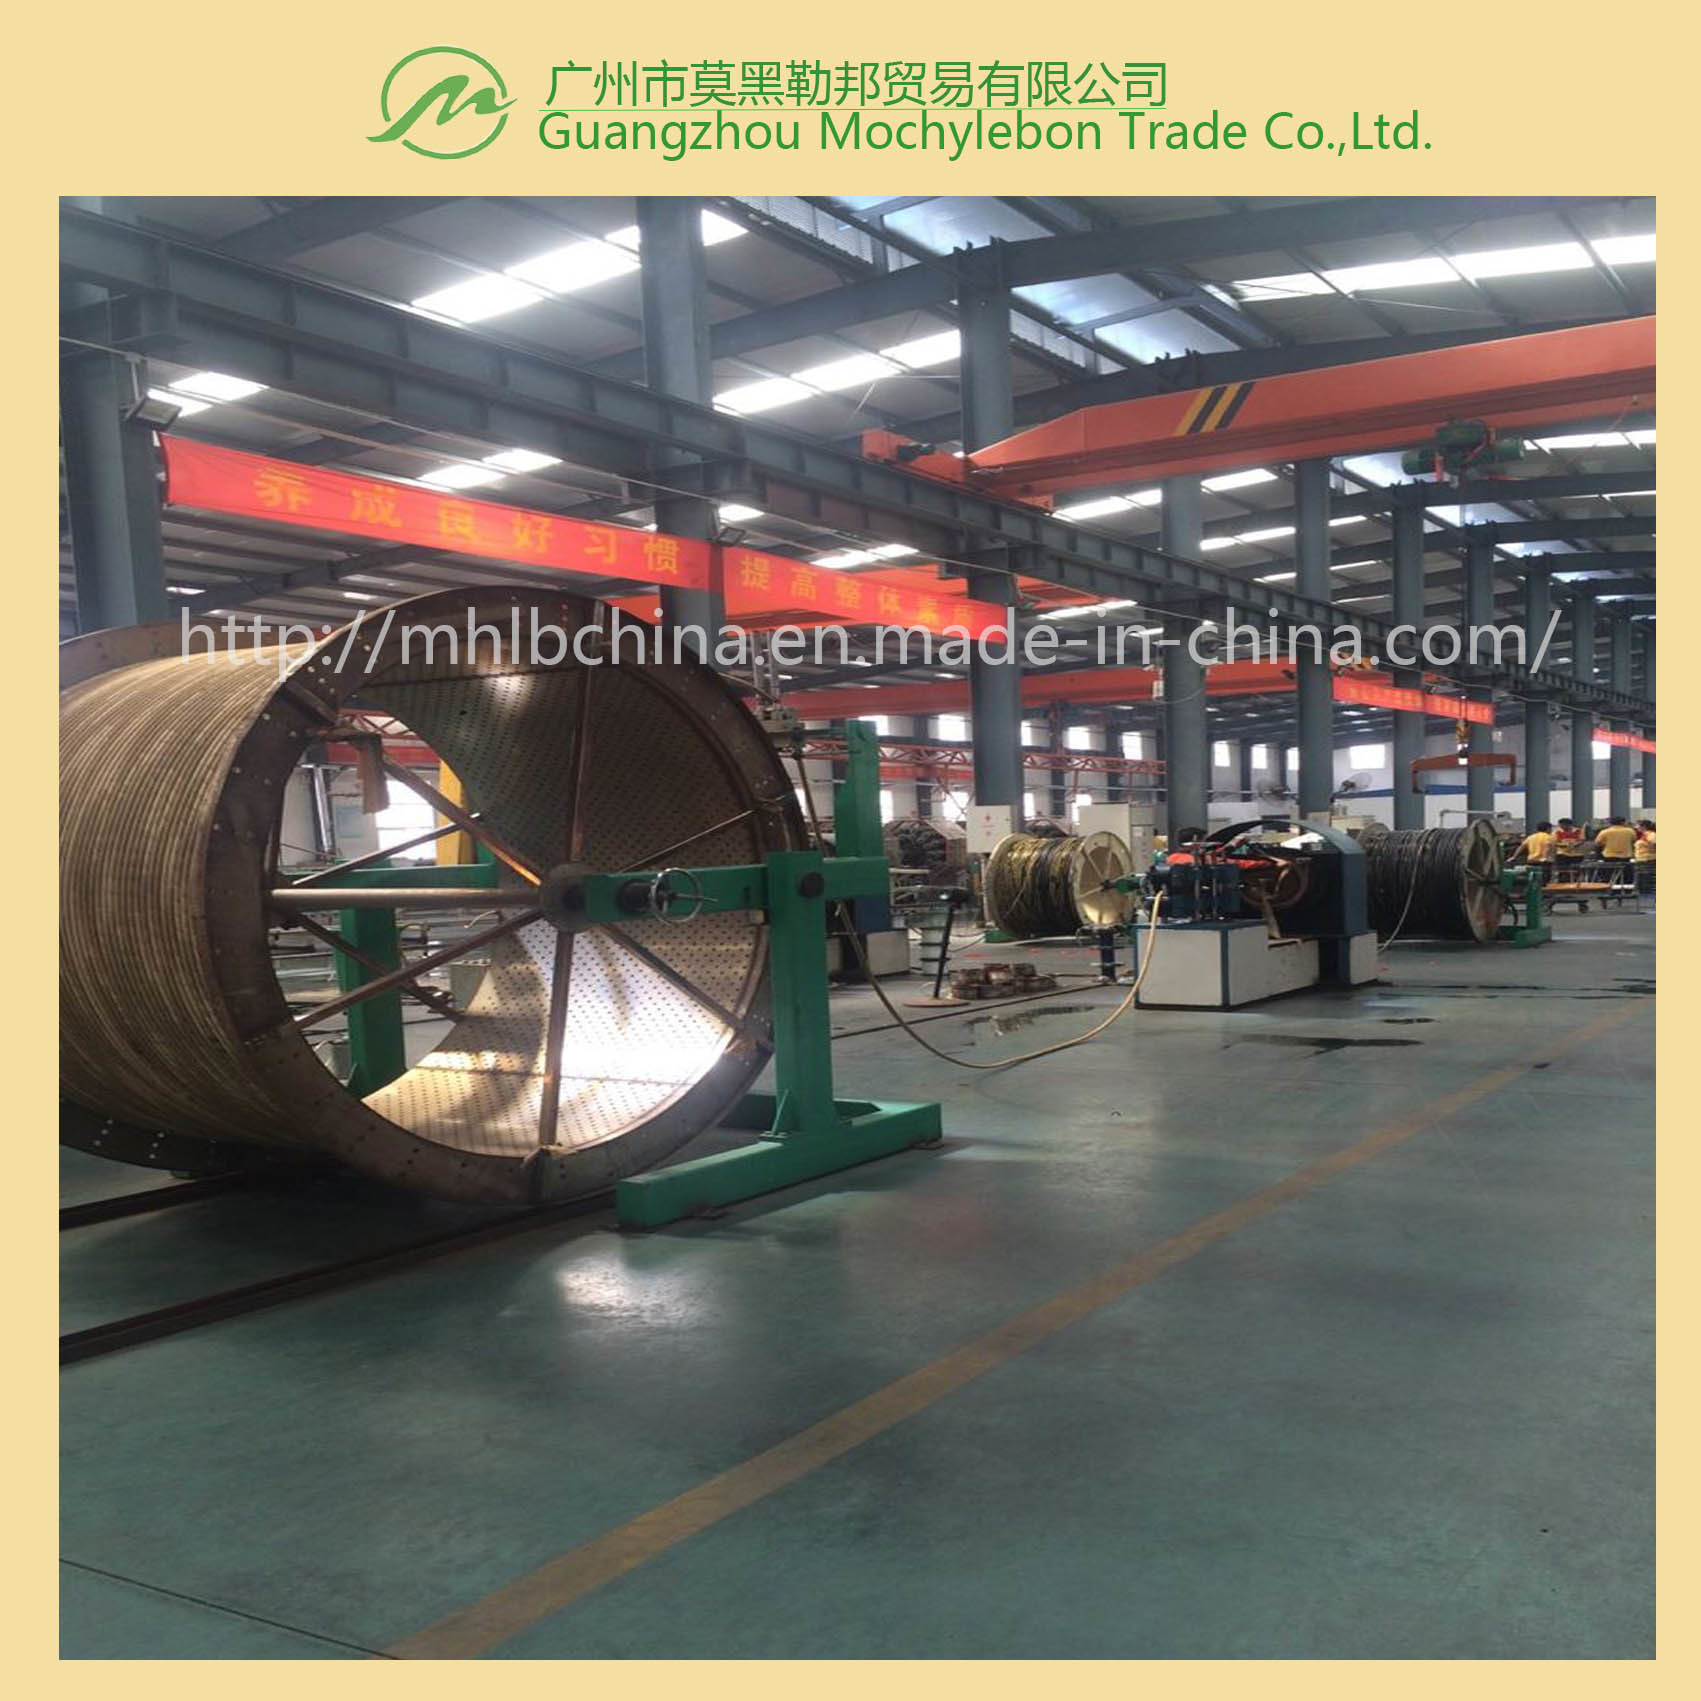 Wire Braided Hydraulic Hose for Coal Mine (602-3B-5/16)